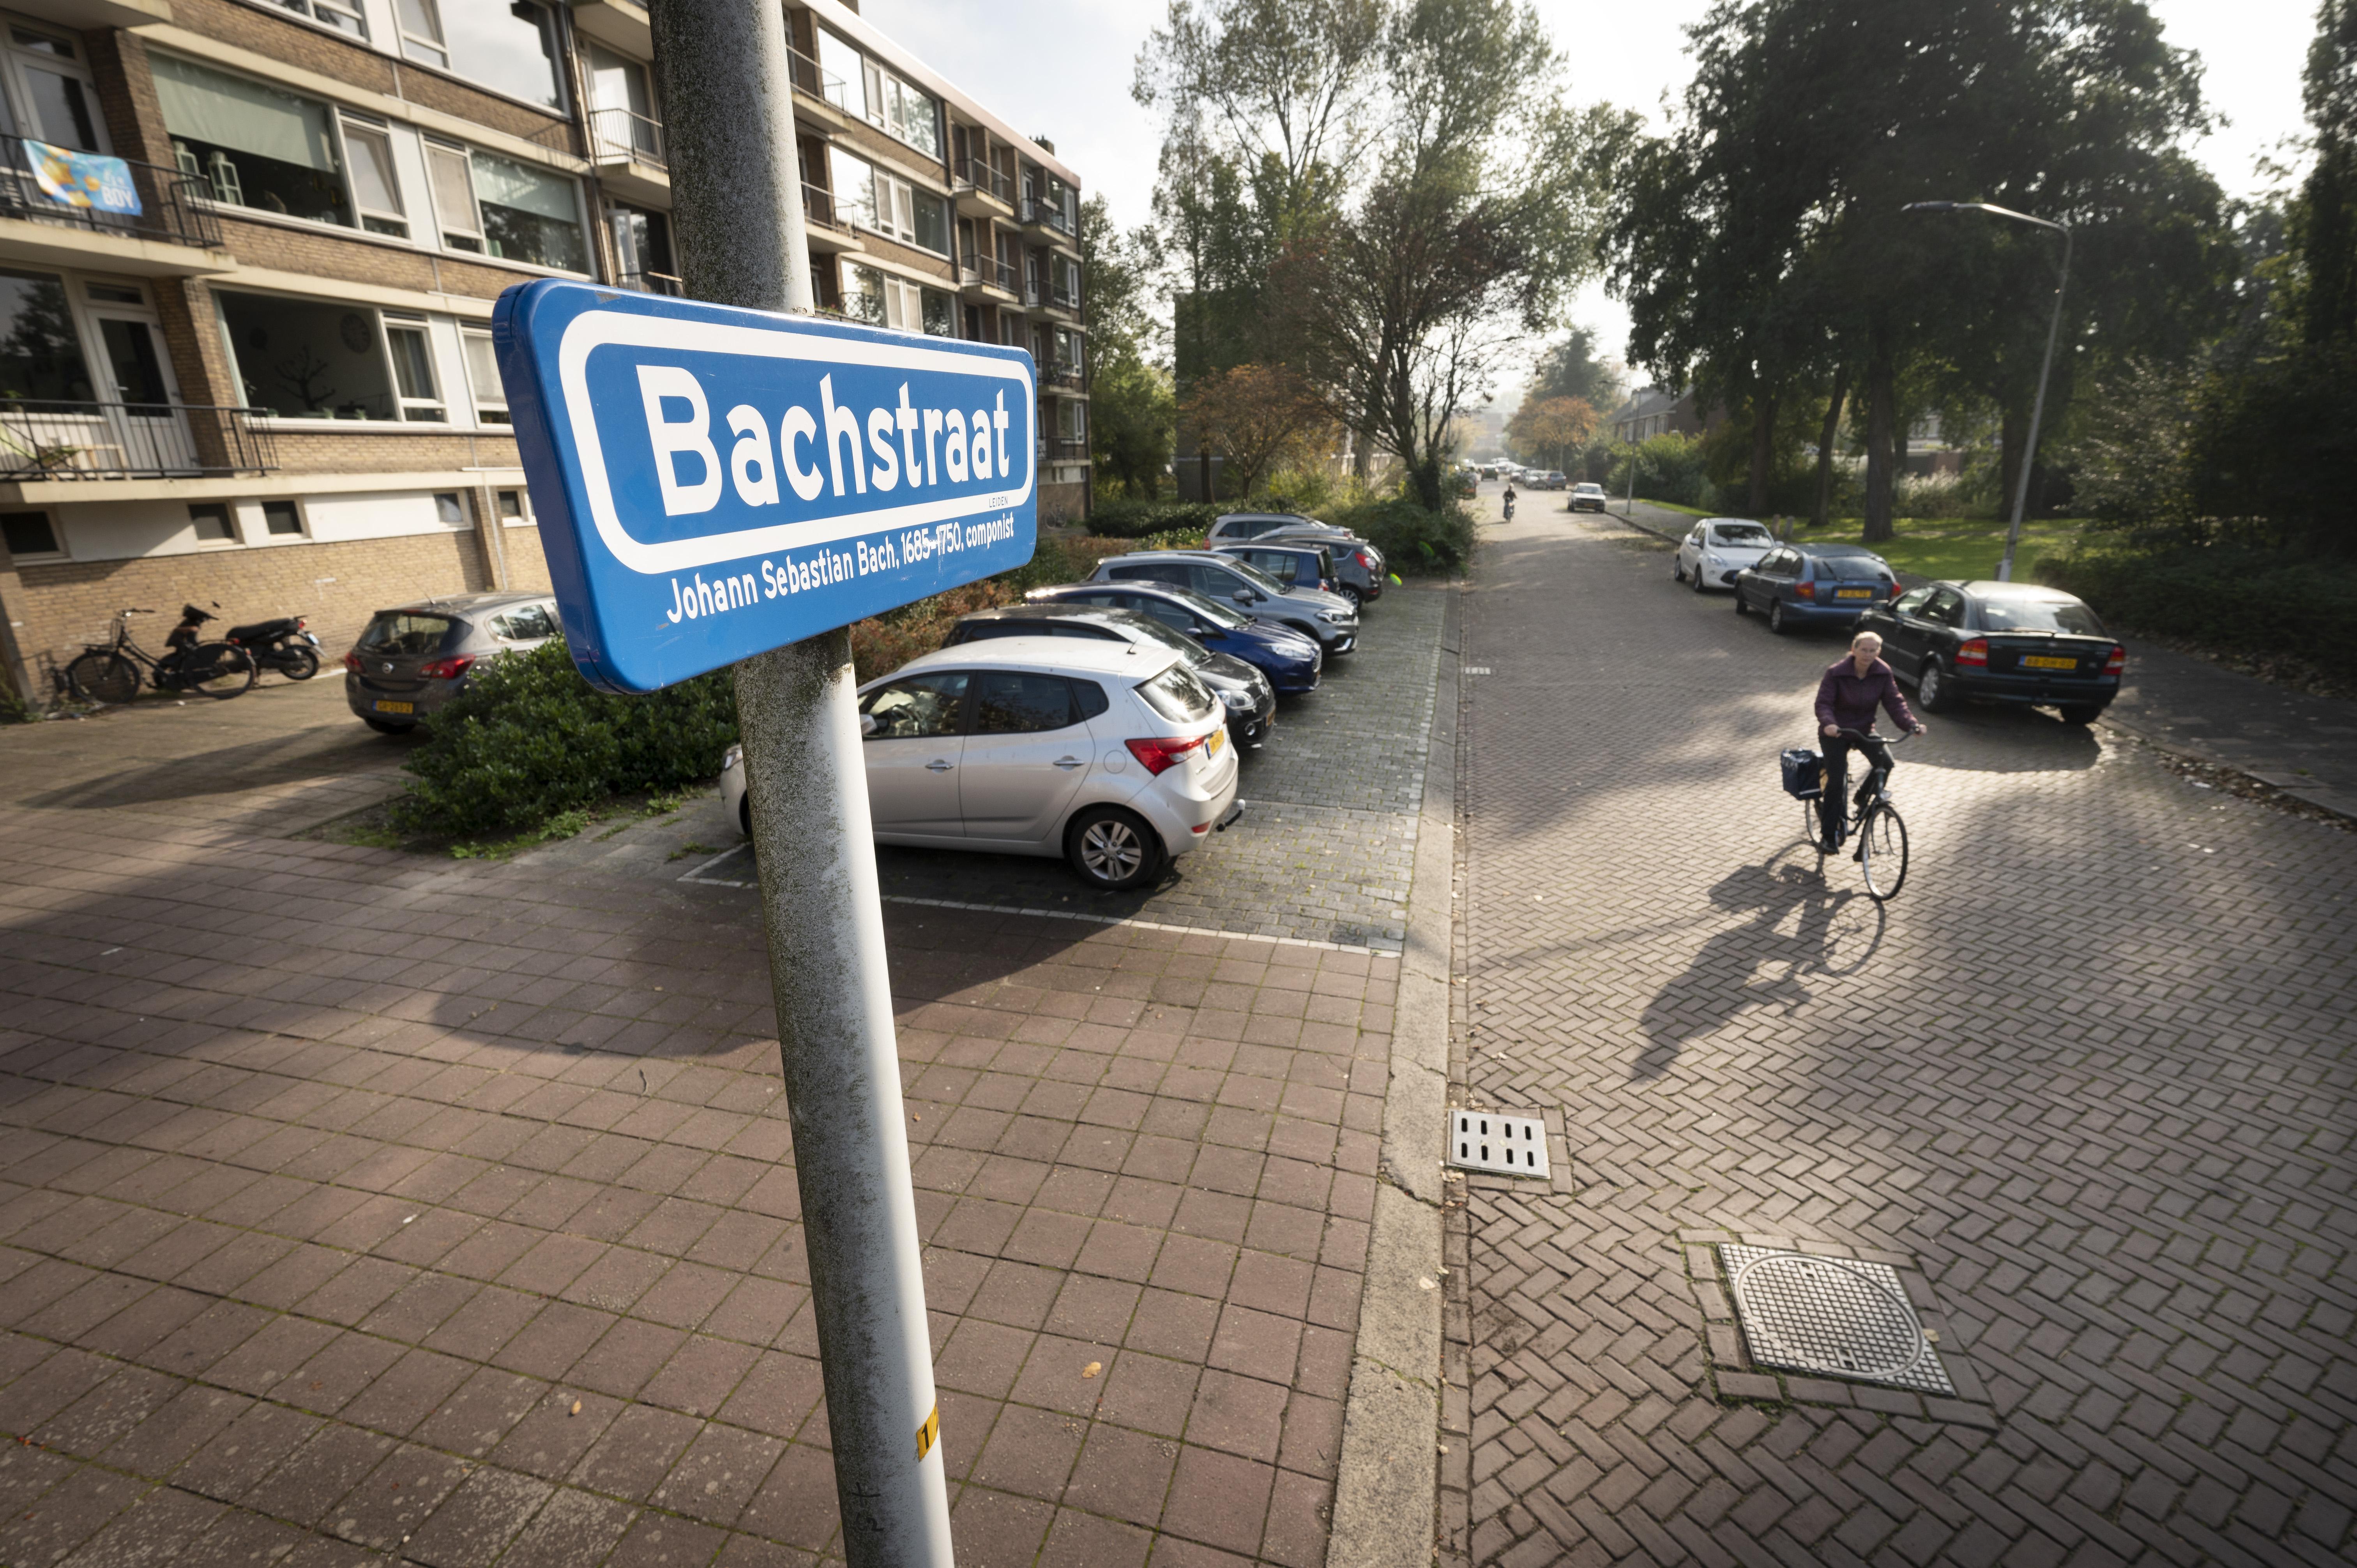 Leiden wil Bachstraat in harmonie opknappen